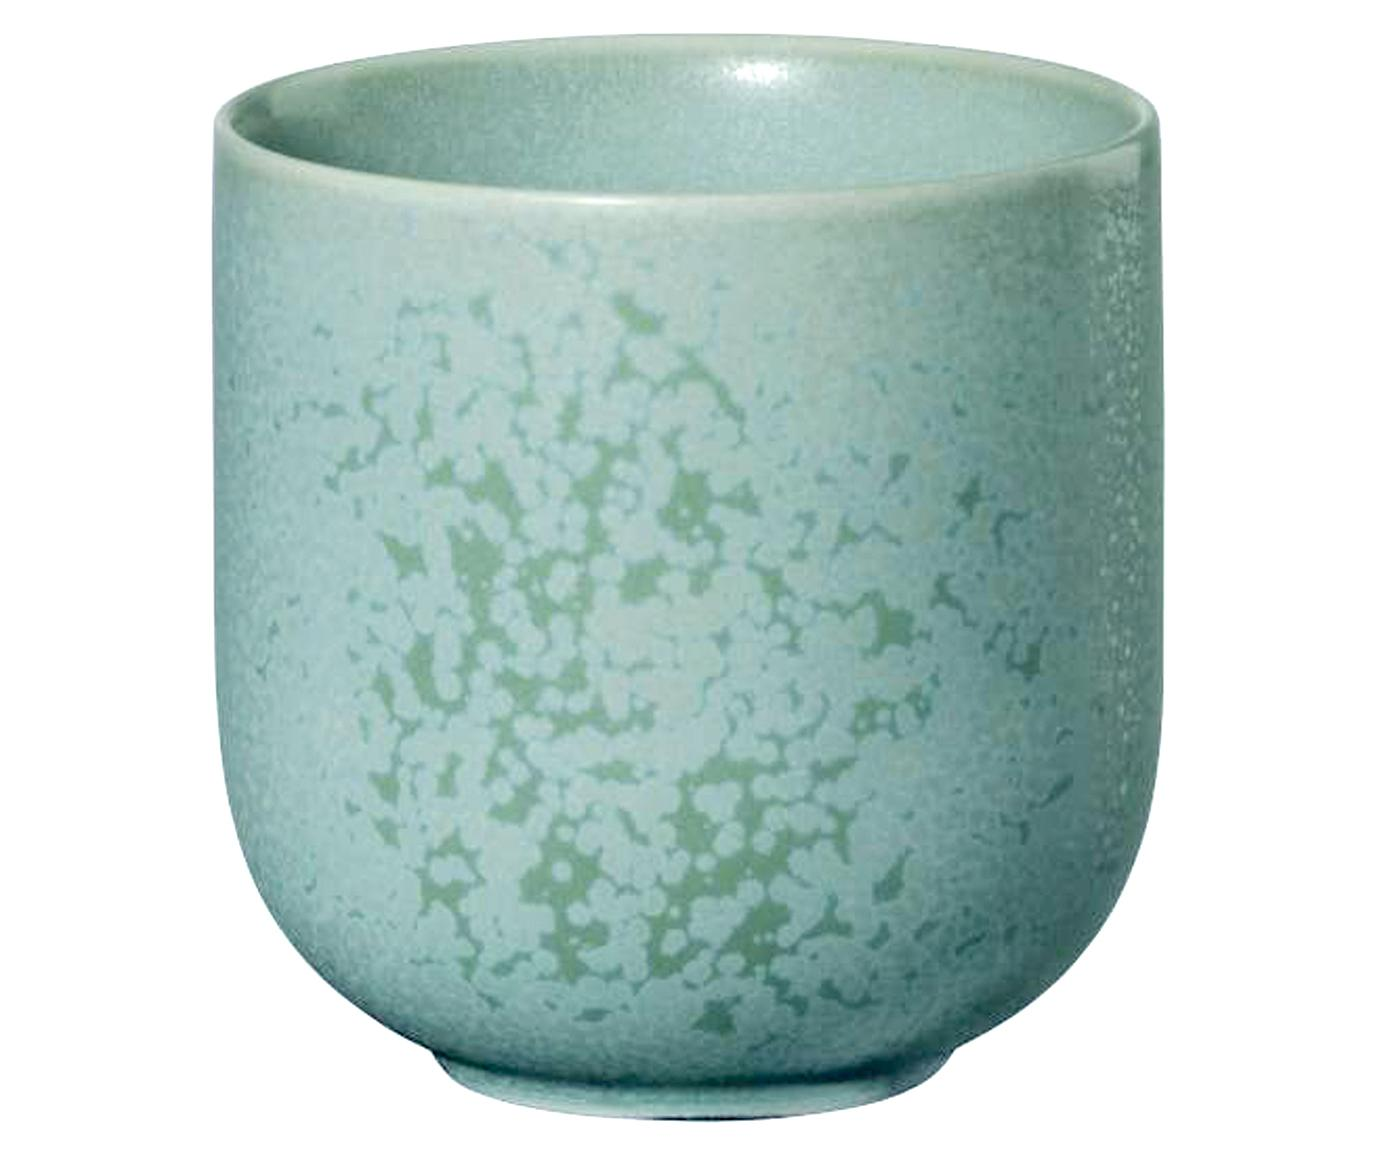 Handgefertigte Becher Coppa in Mintgrün und braun gesprenkelt, 2 Stück, Porzellan, Mintgrün, Ø 8 x H 8 cm